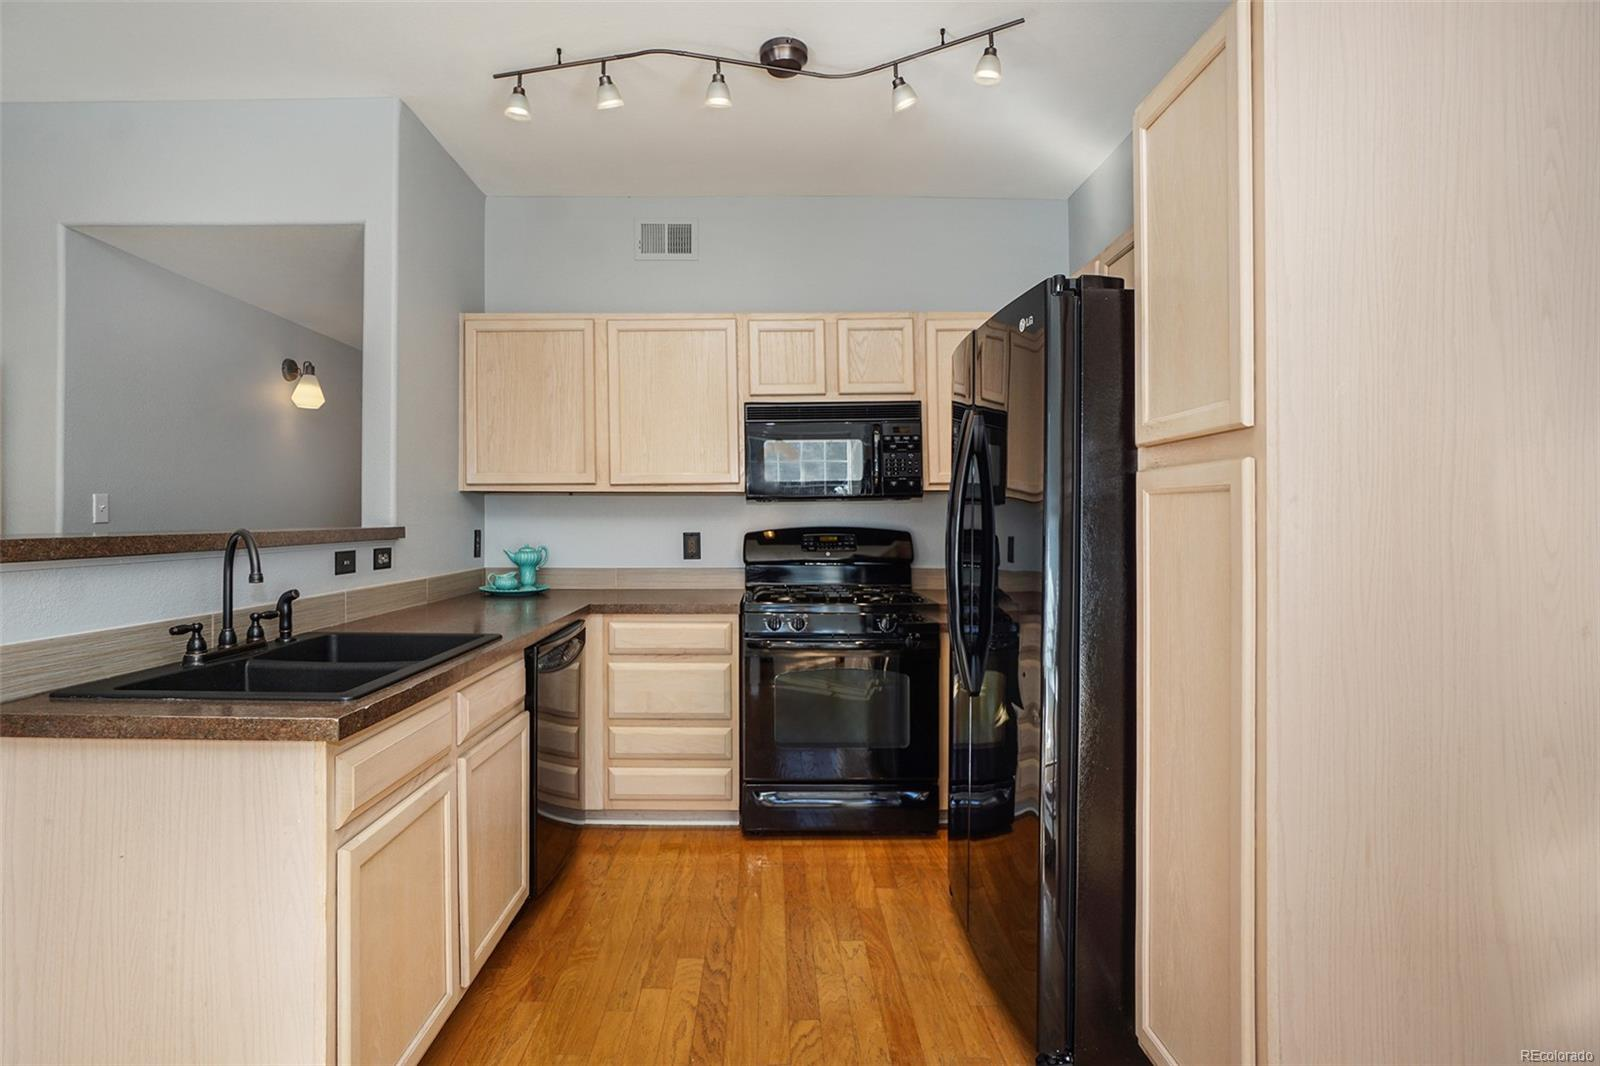 Clean & functional kitchen with open floorplan